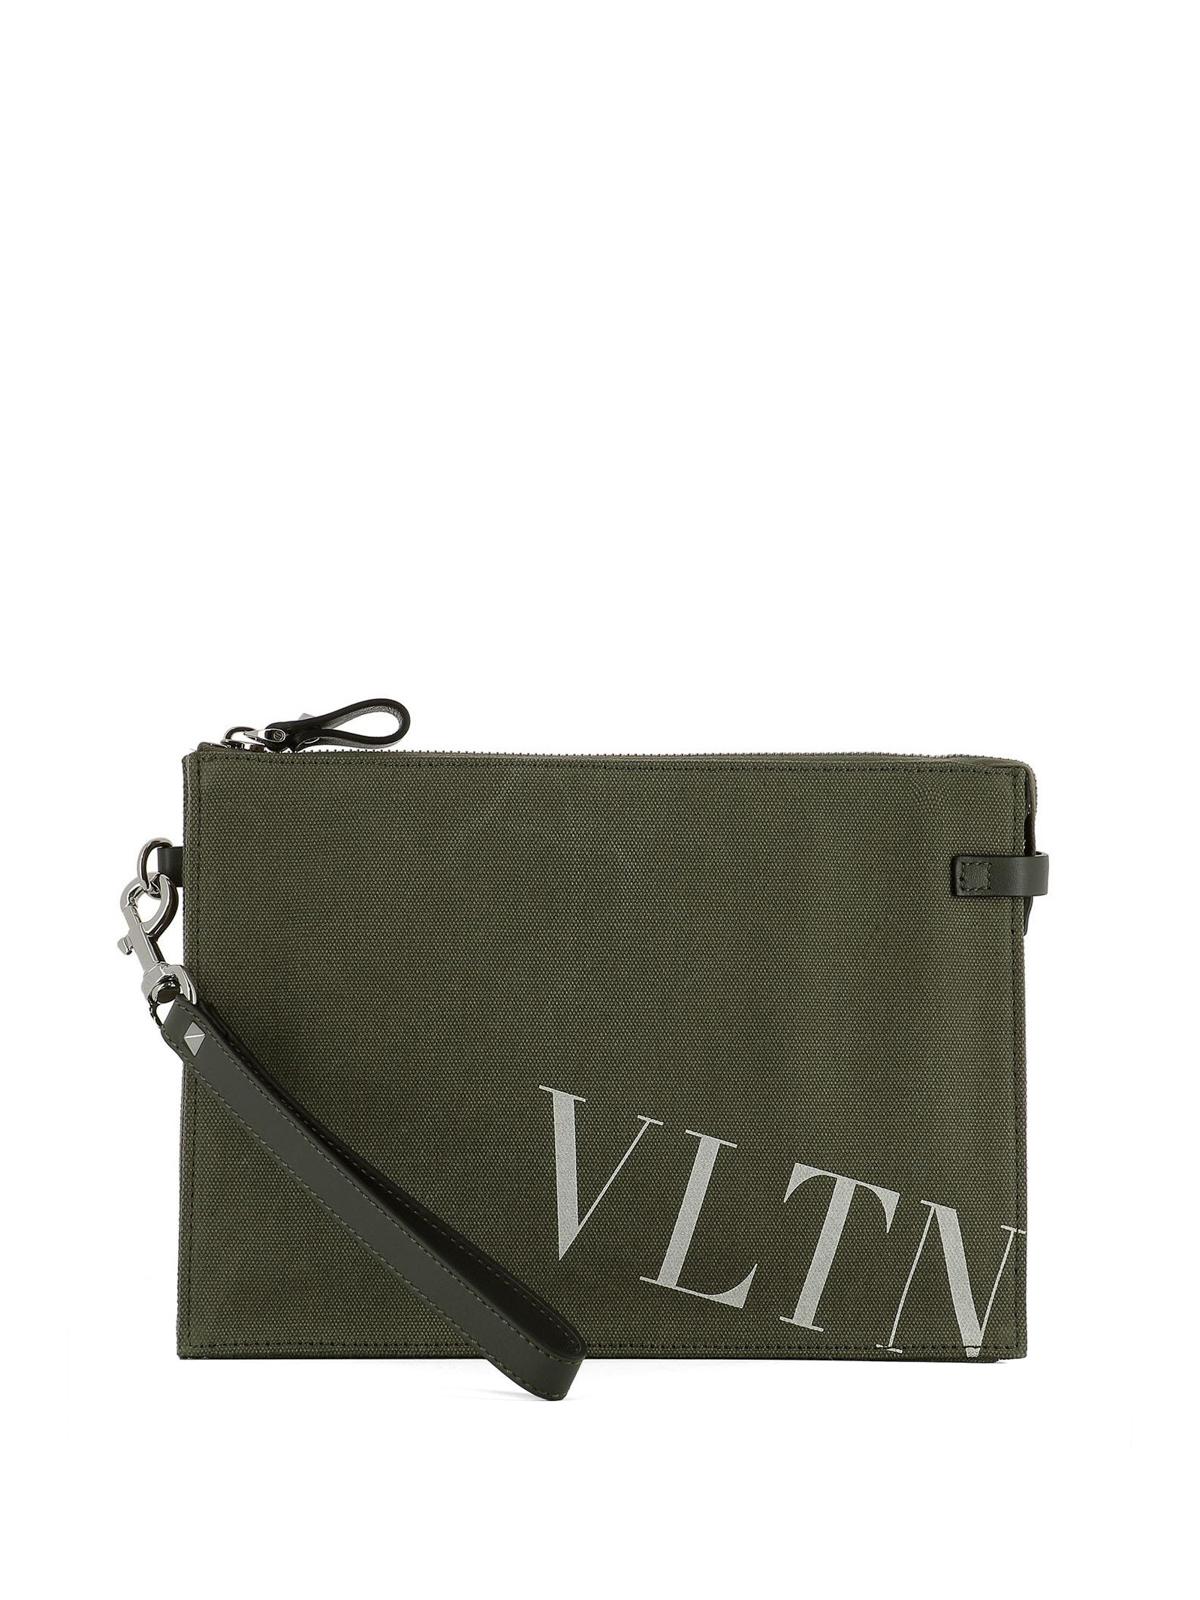 1912aad316 valentino-garavani-clutches-vltn-army-green-canvas-pouch -00000133763f00s001.jpg